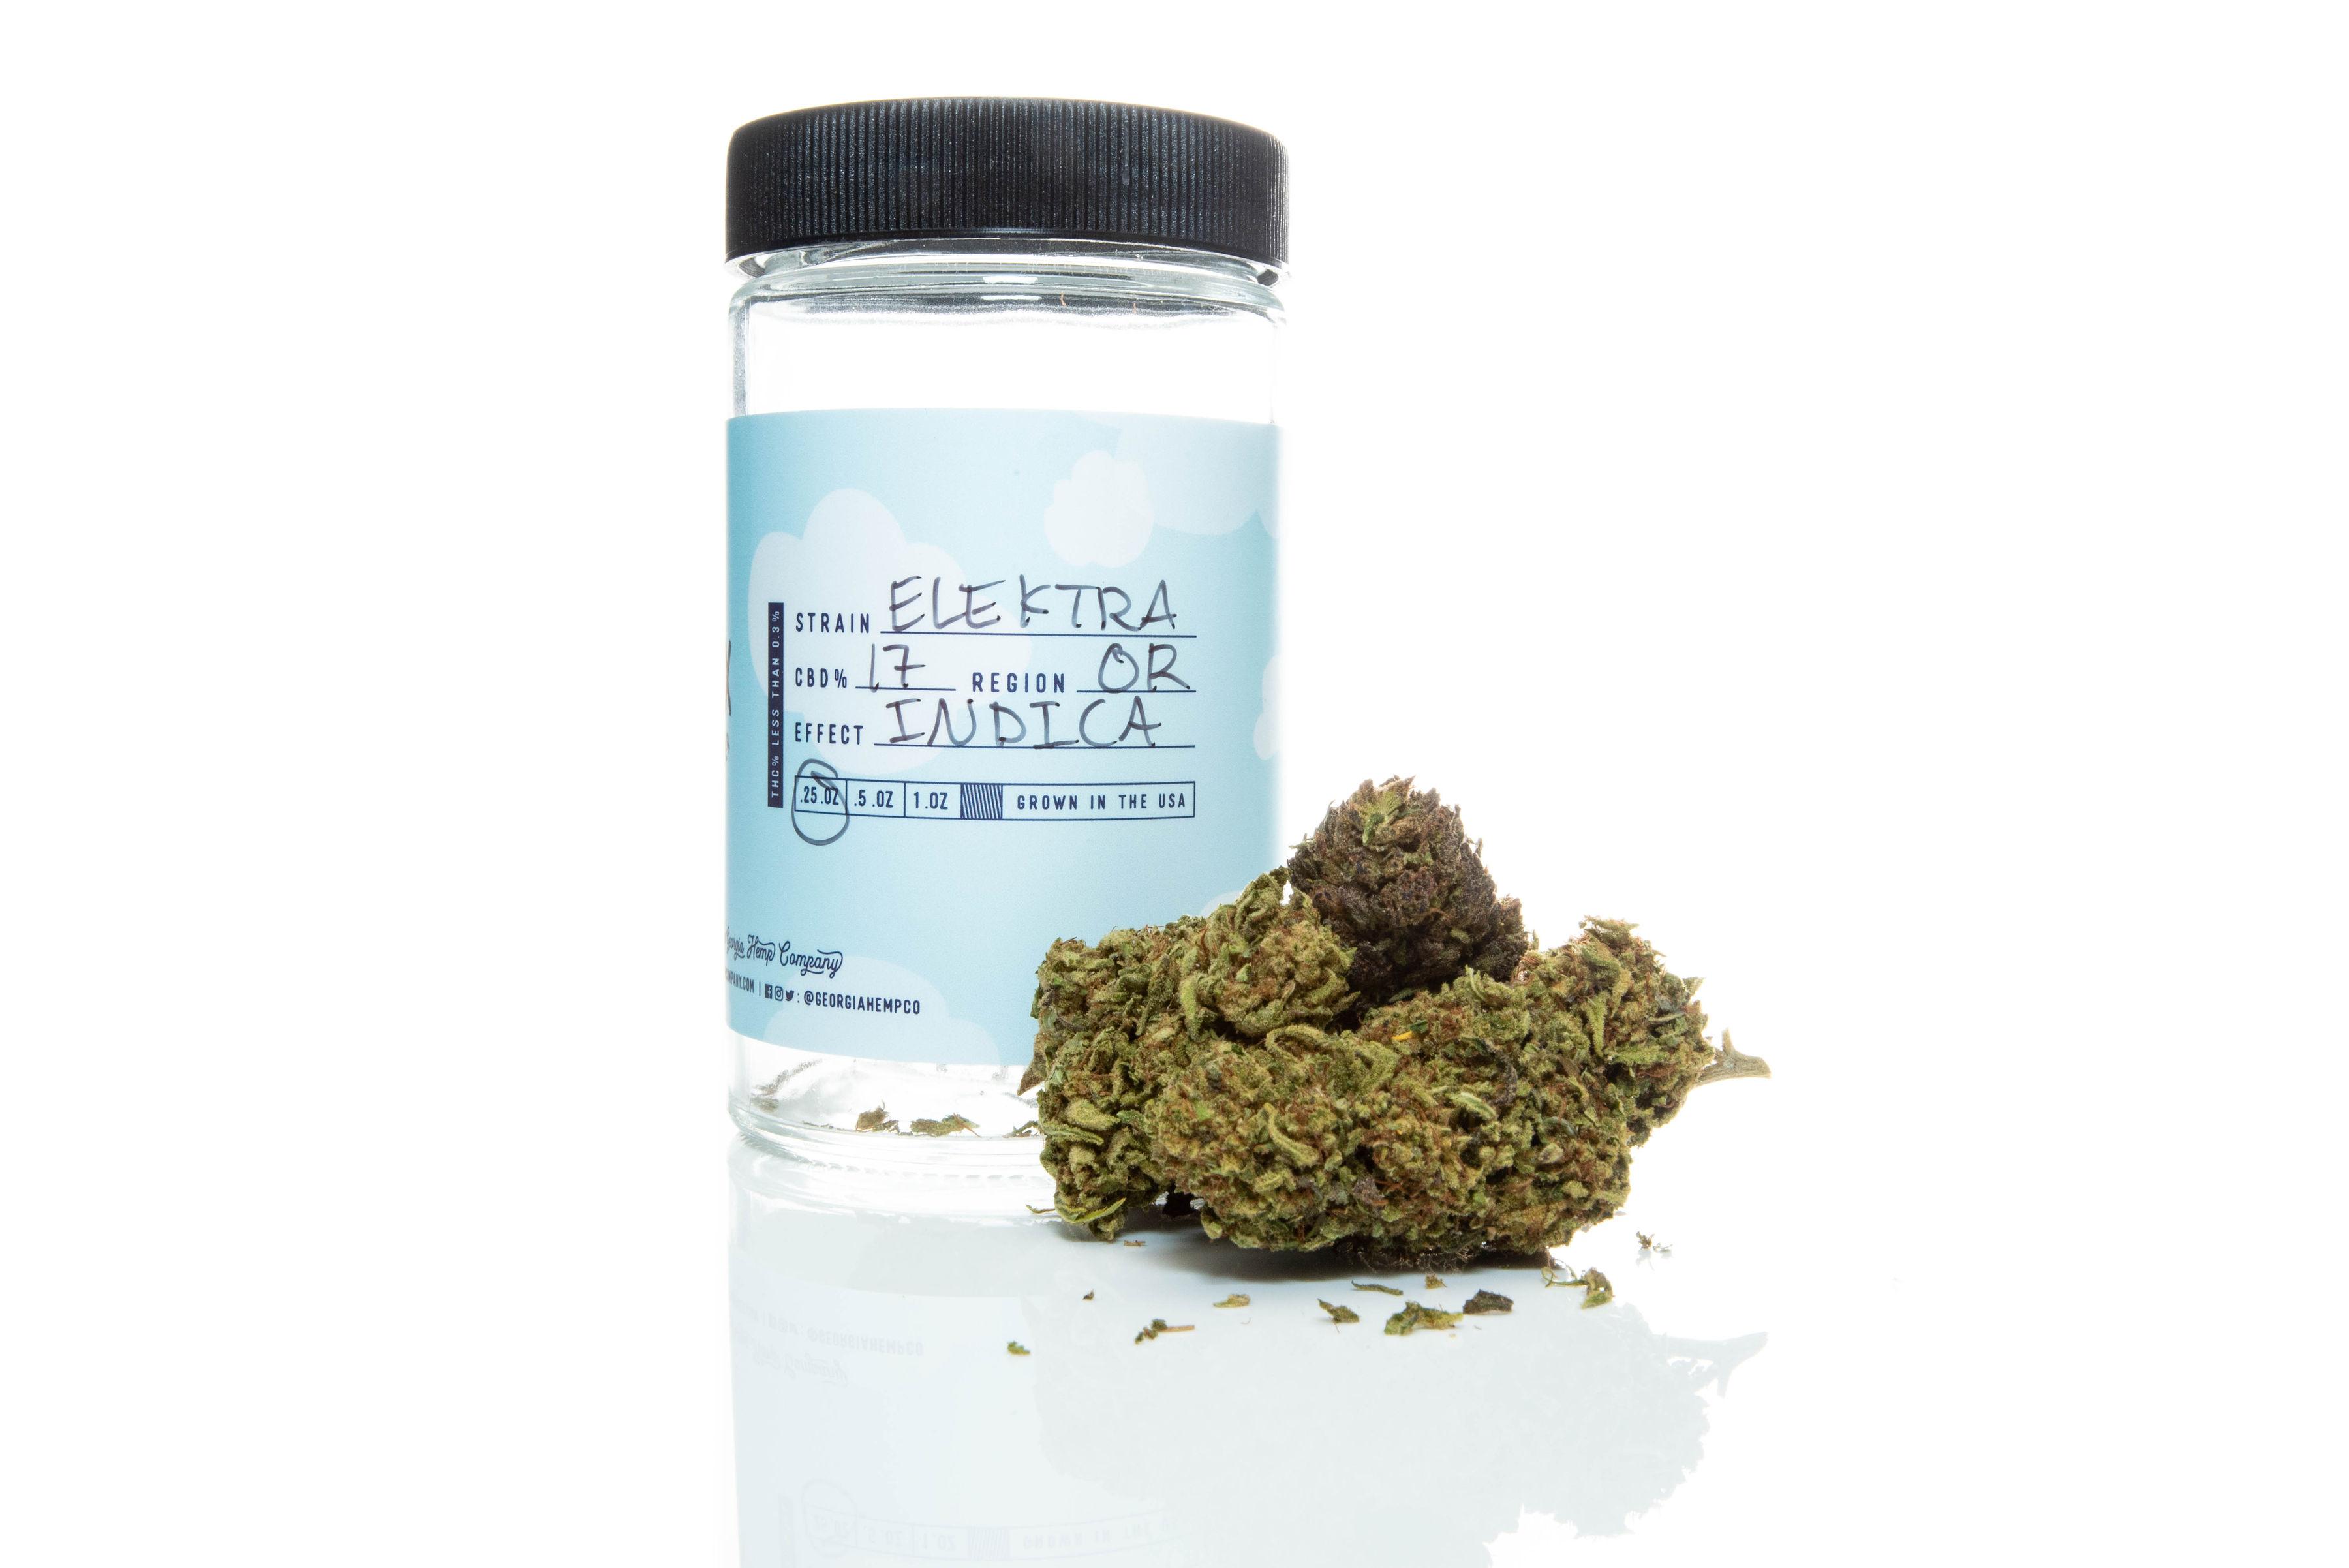 Elektra 16% 7g Quarter/Oz Hemp Flower Strain from The Georgia Hemp Company